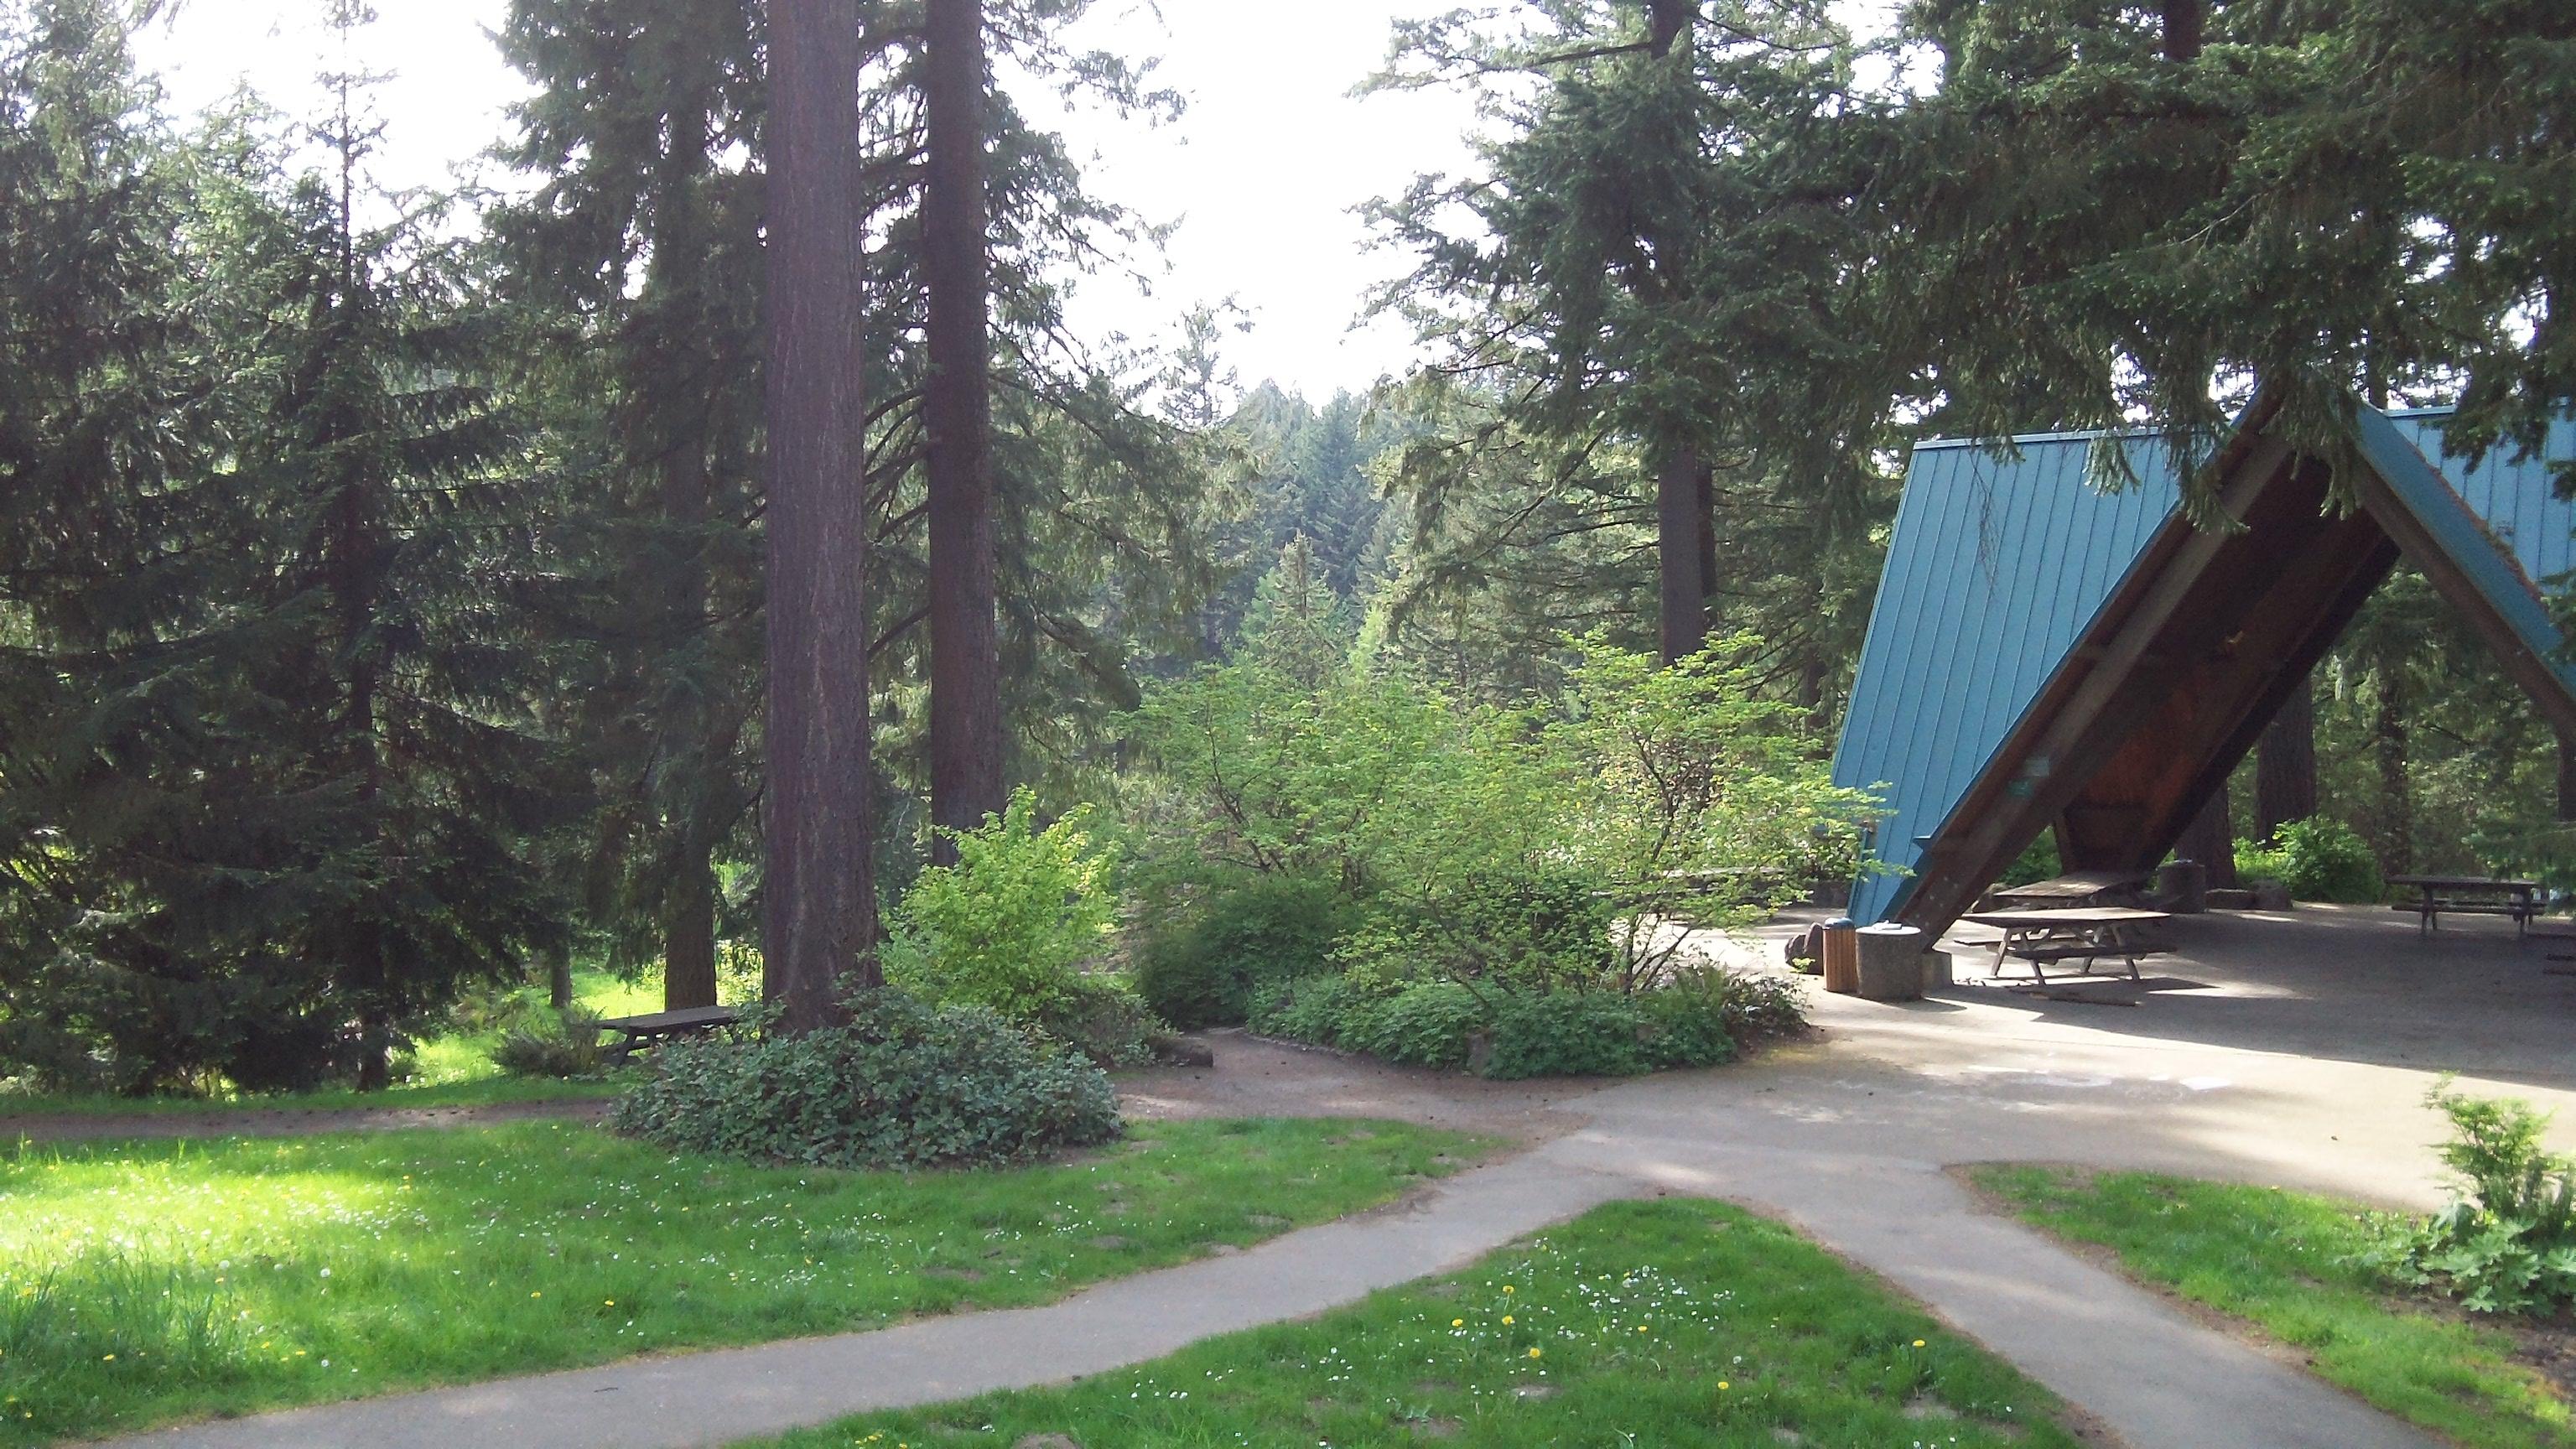 Southwest Portland Park - The Hoyt Arboretum at Washington Park